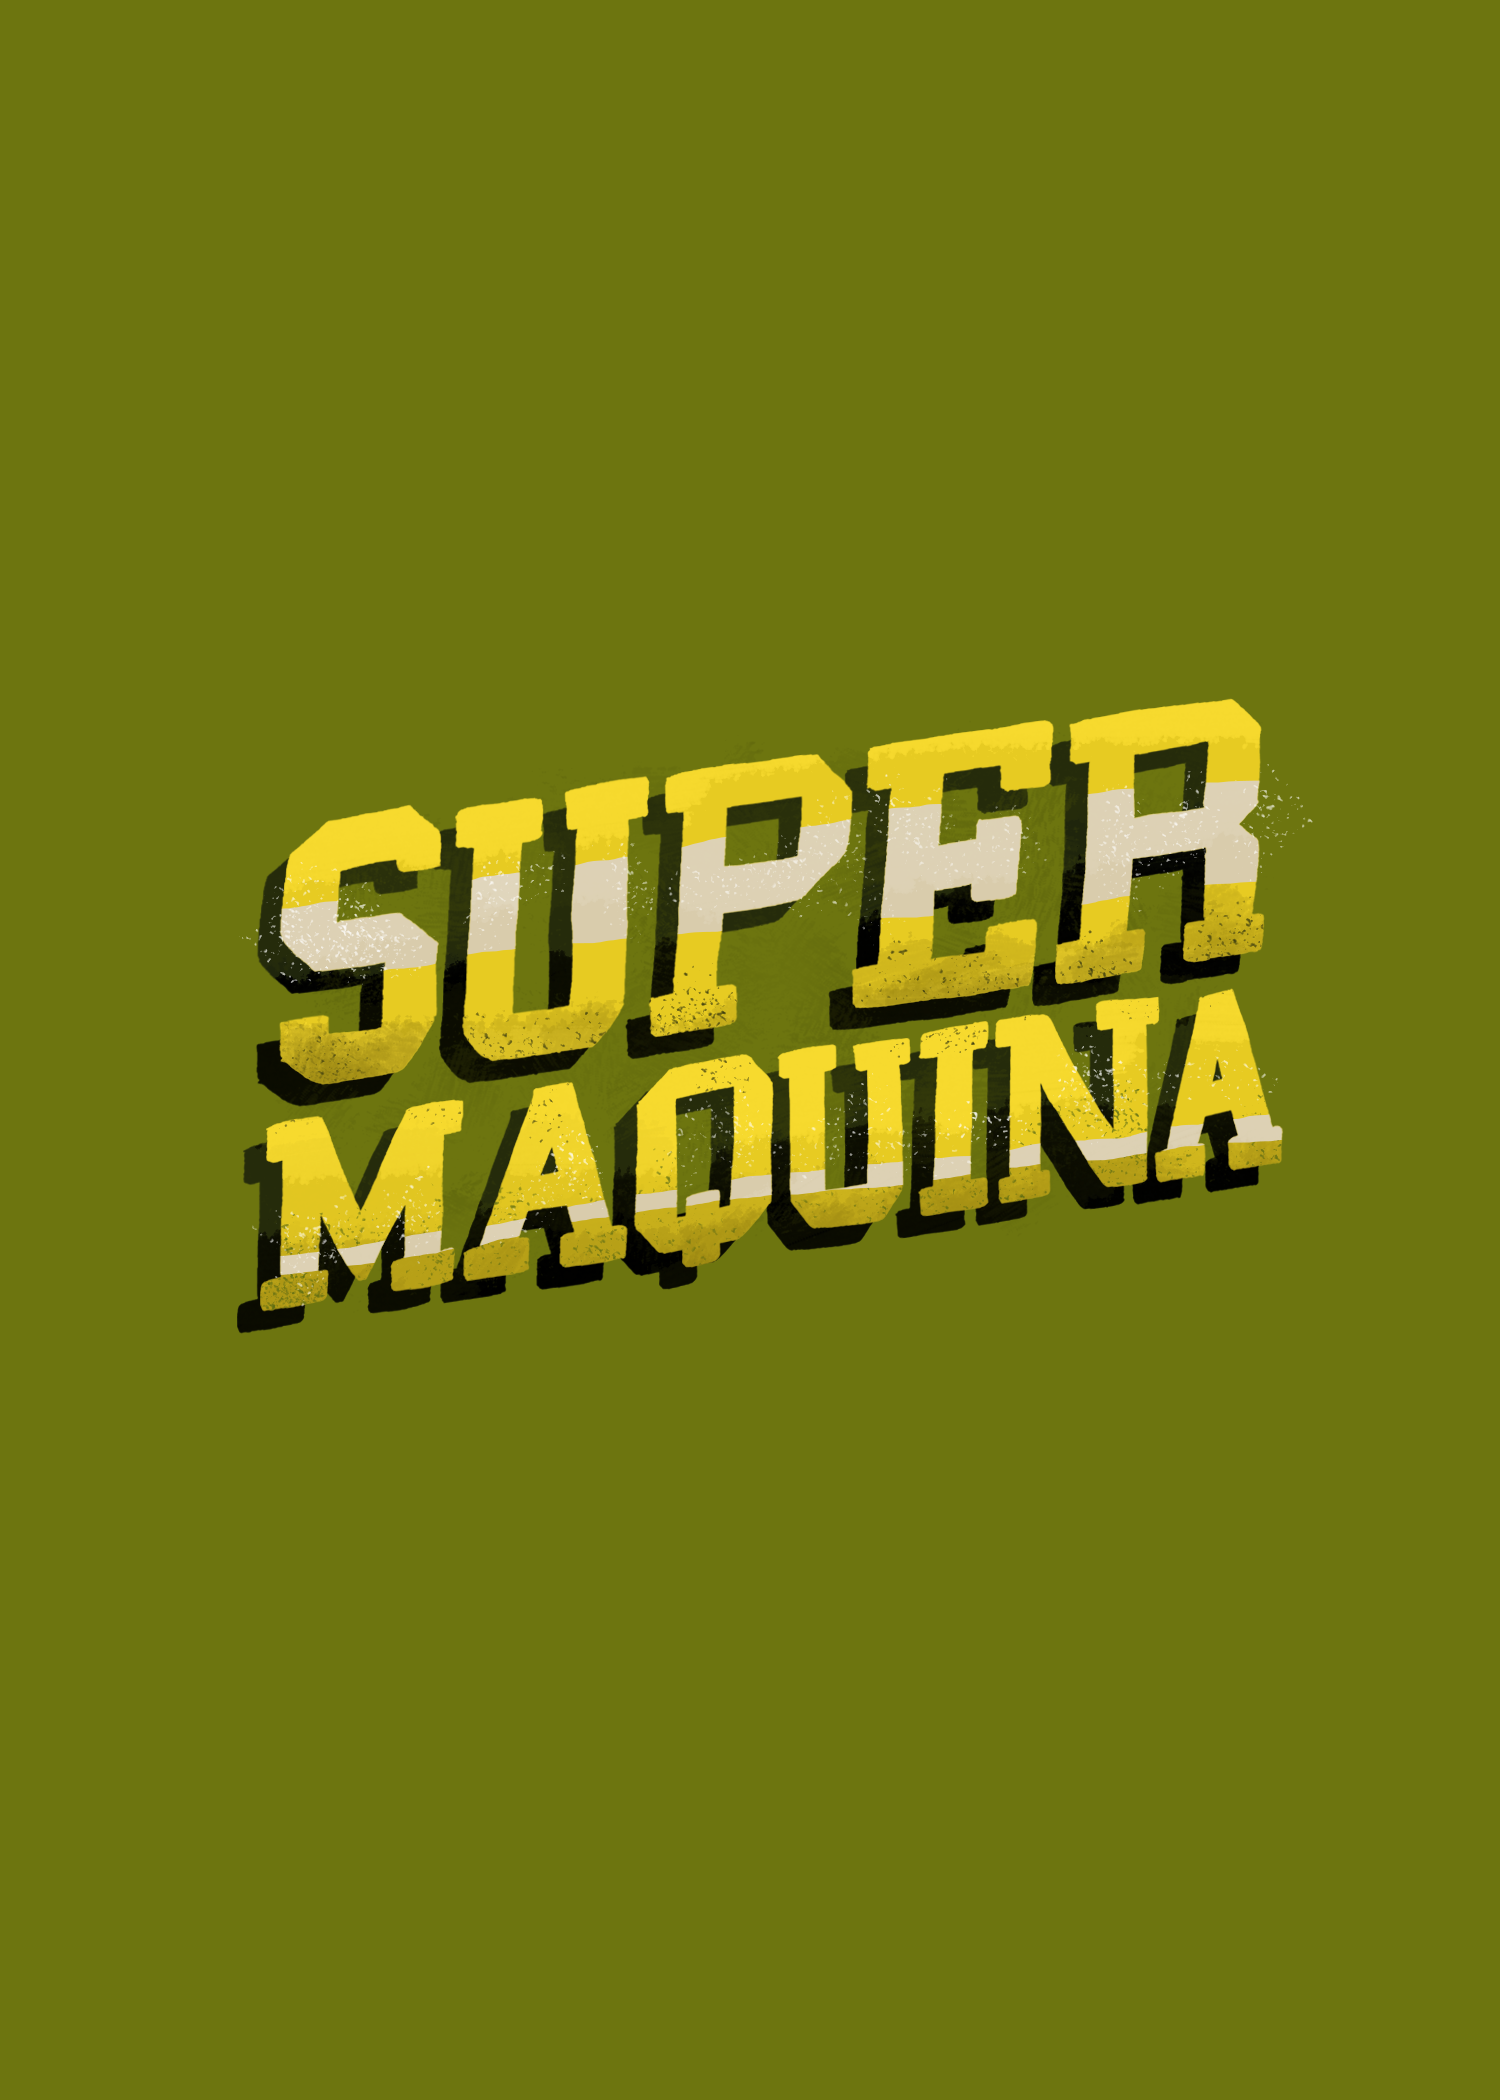 24.SuperMaquina.png